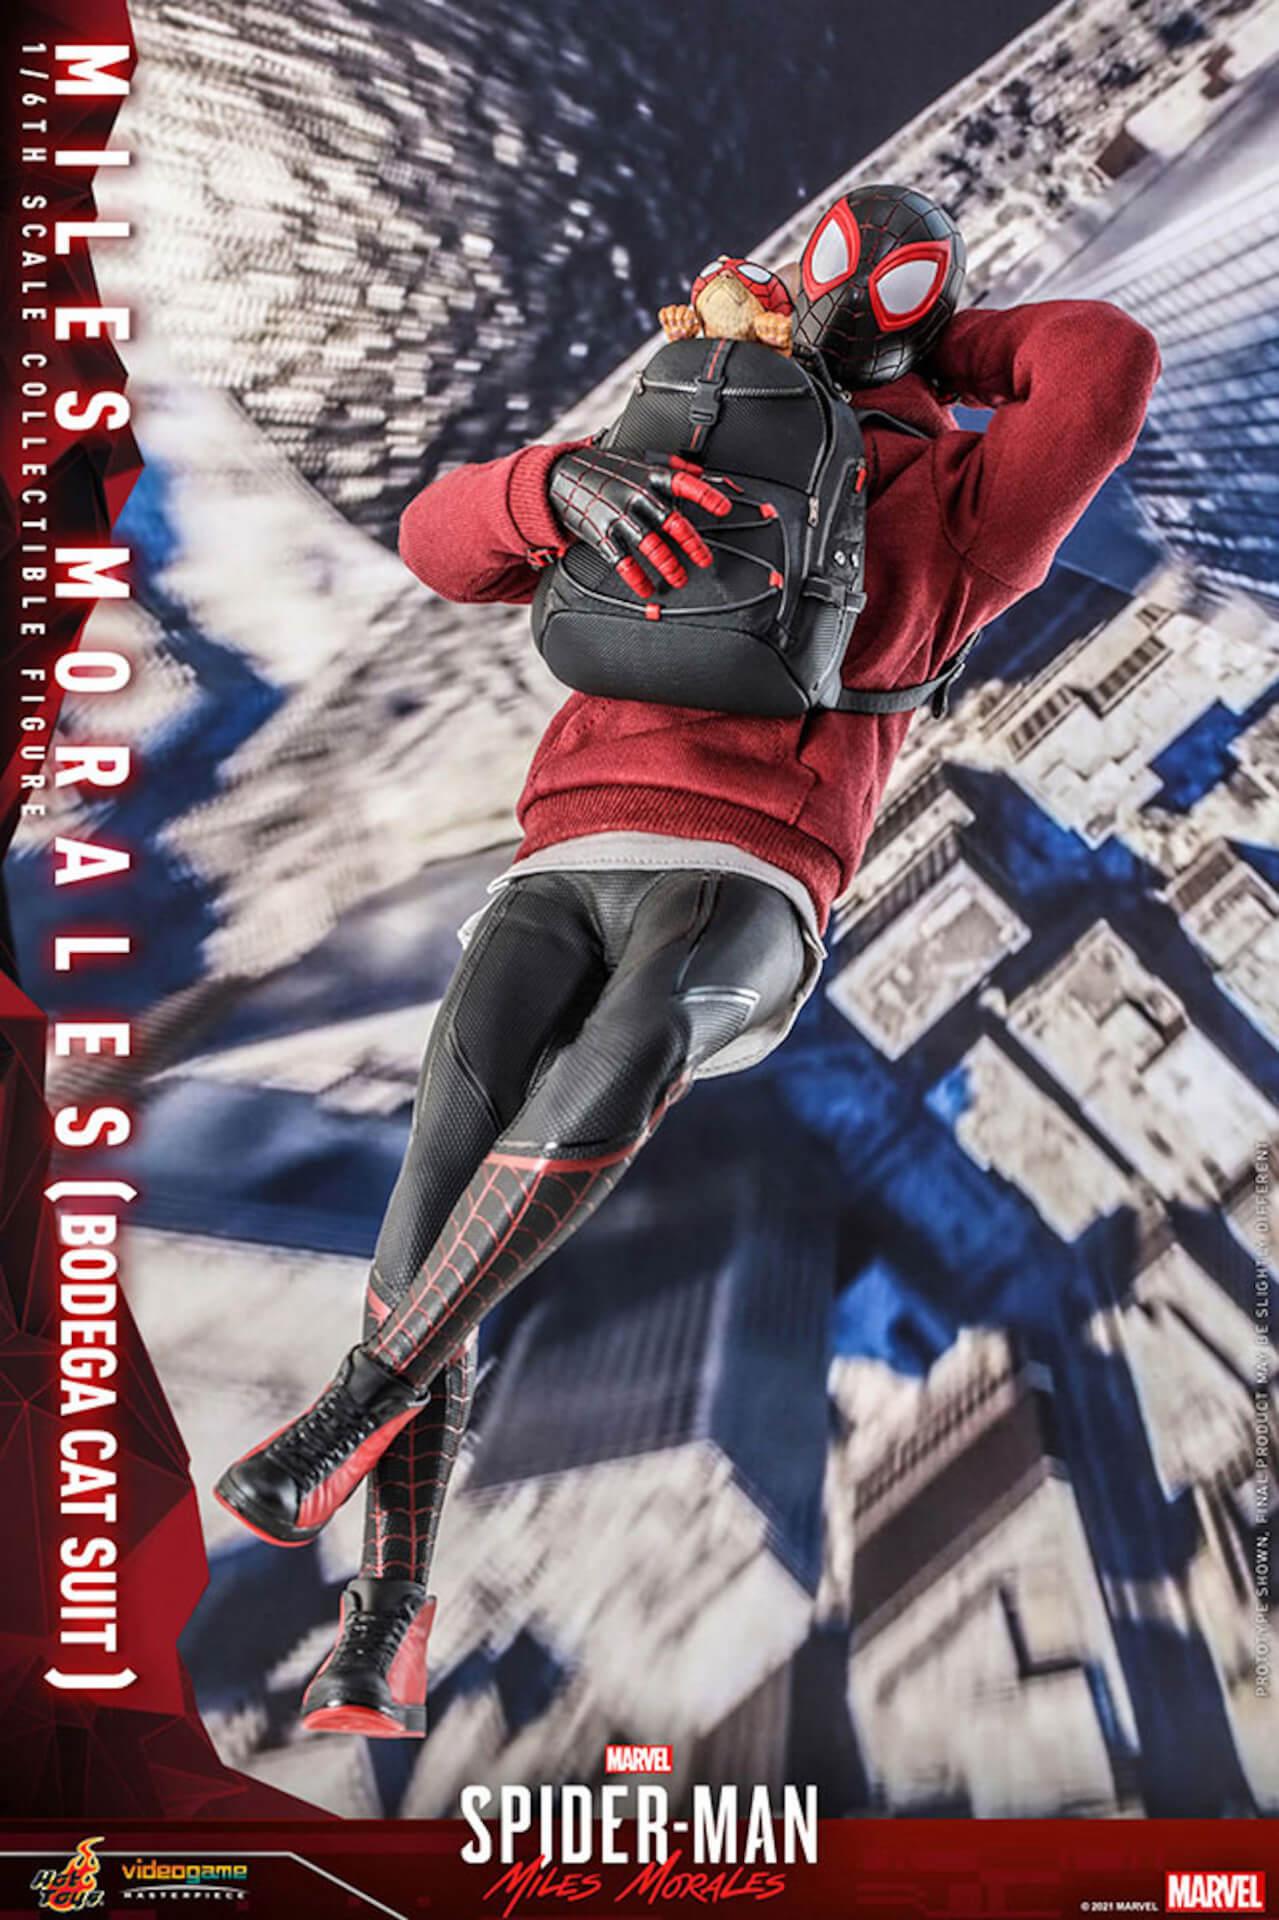 『Marvel's Spider-Man:Miles Morales』のスパイダーマンがホットトイズで超精巧なフィギュアになって登場! art210601_spiderman_hottoys_3